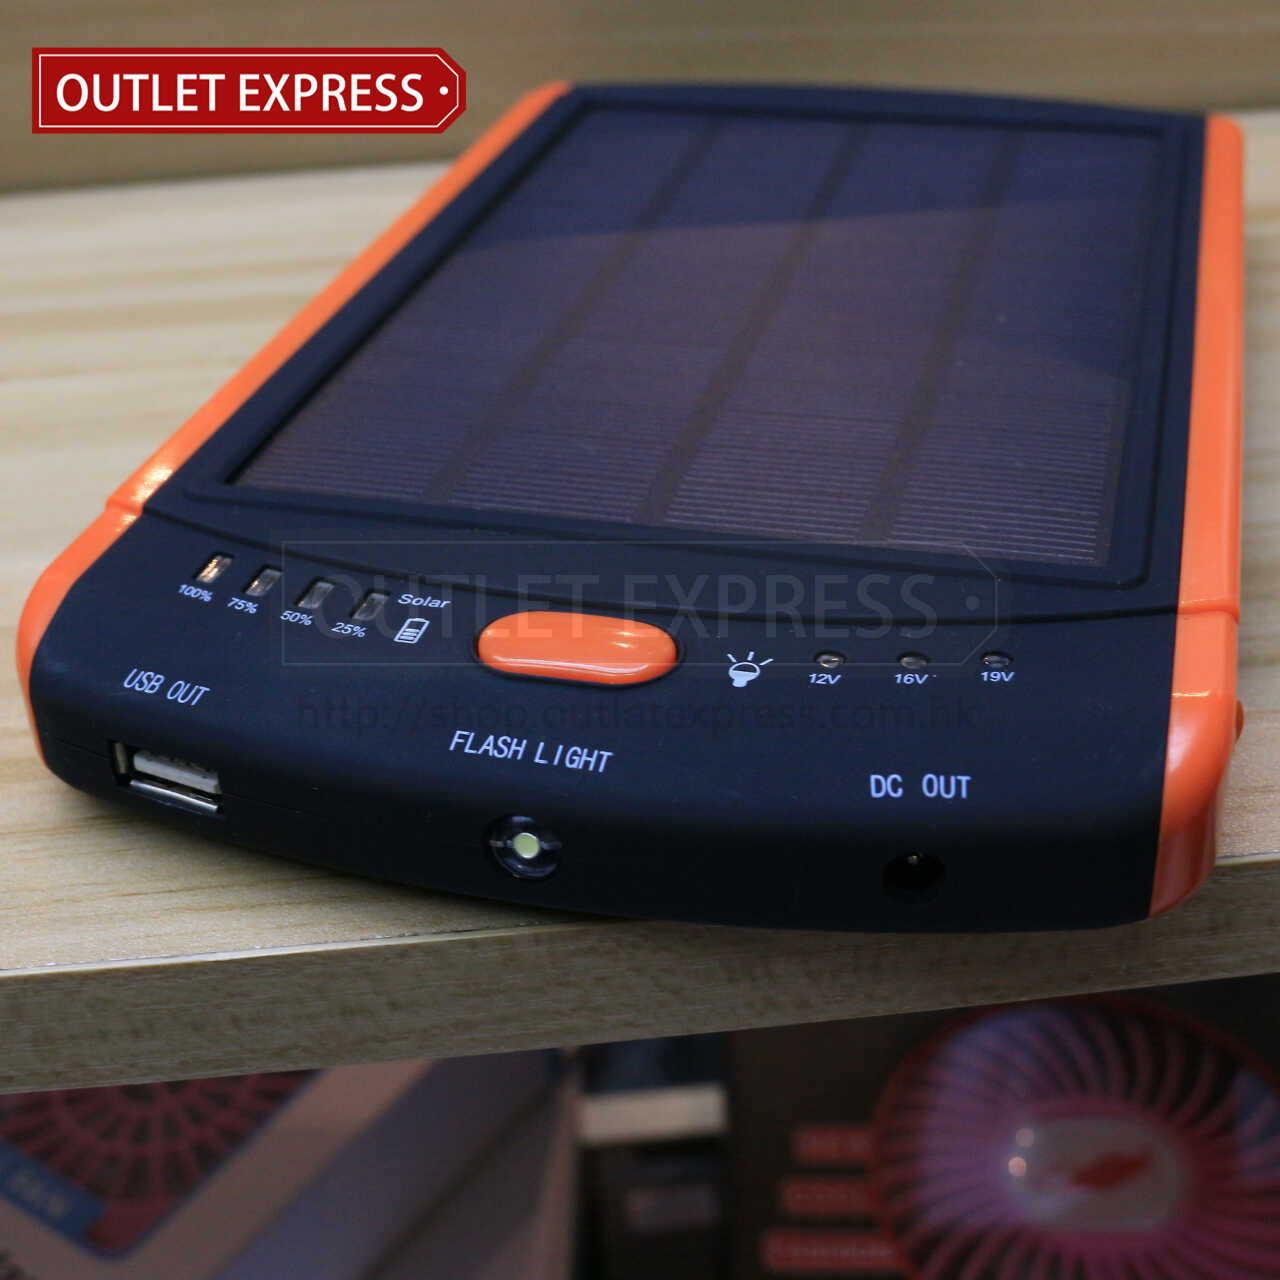 23000mAH 超薄太陽能移動電源 板面- Outlet Express HK 生活百貨城實拍圖